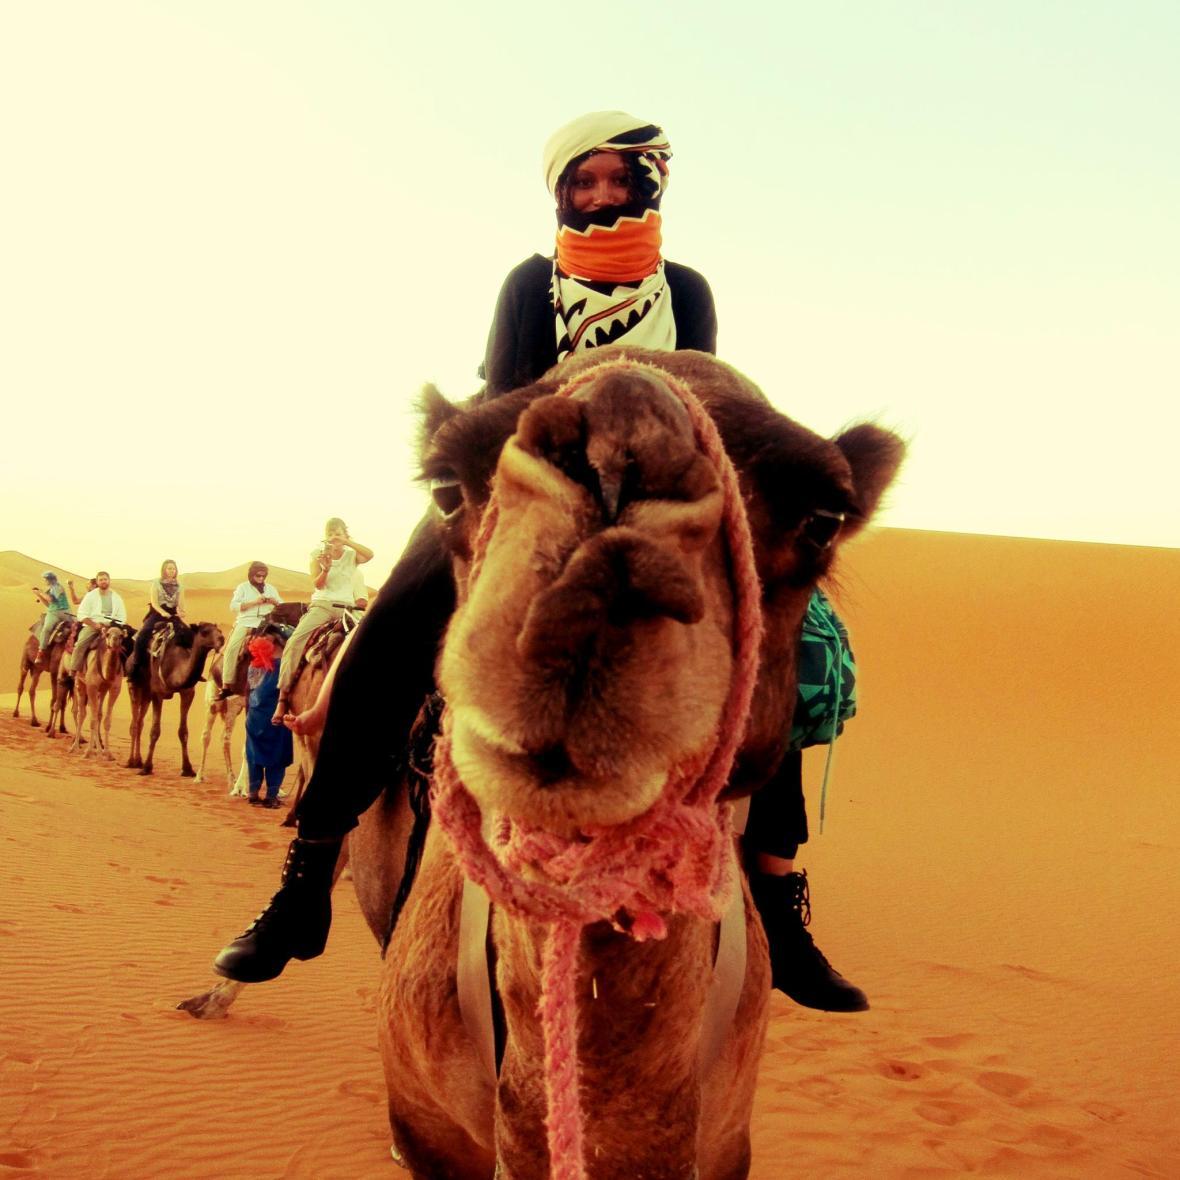 Khadijat Oseni-Ride A Camel-Jetsetterproblems.com